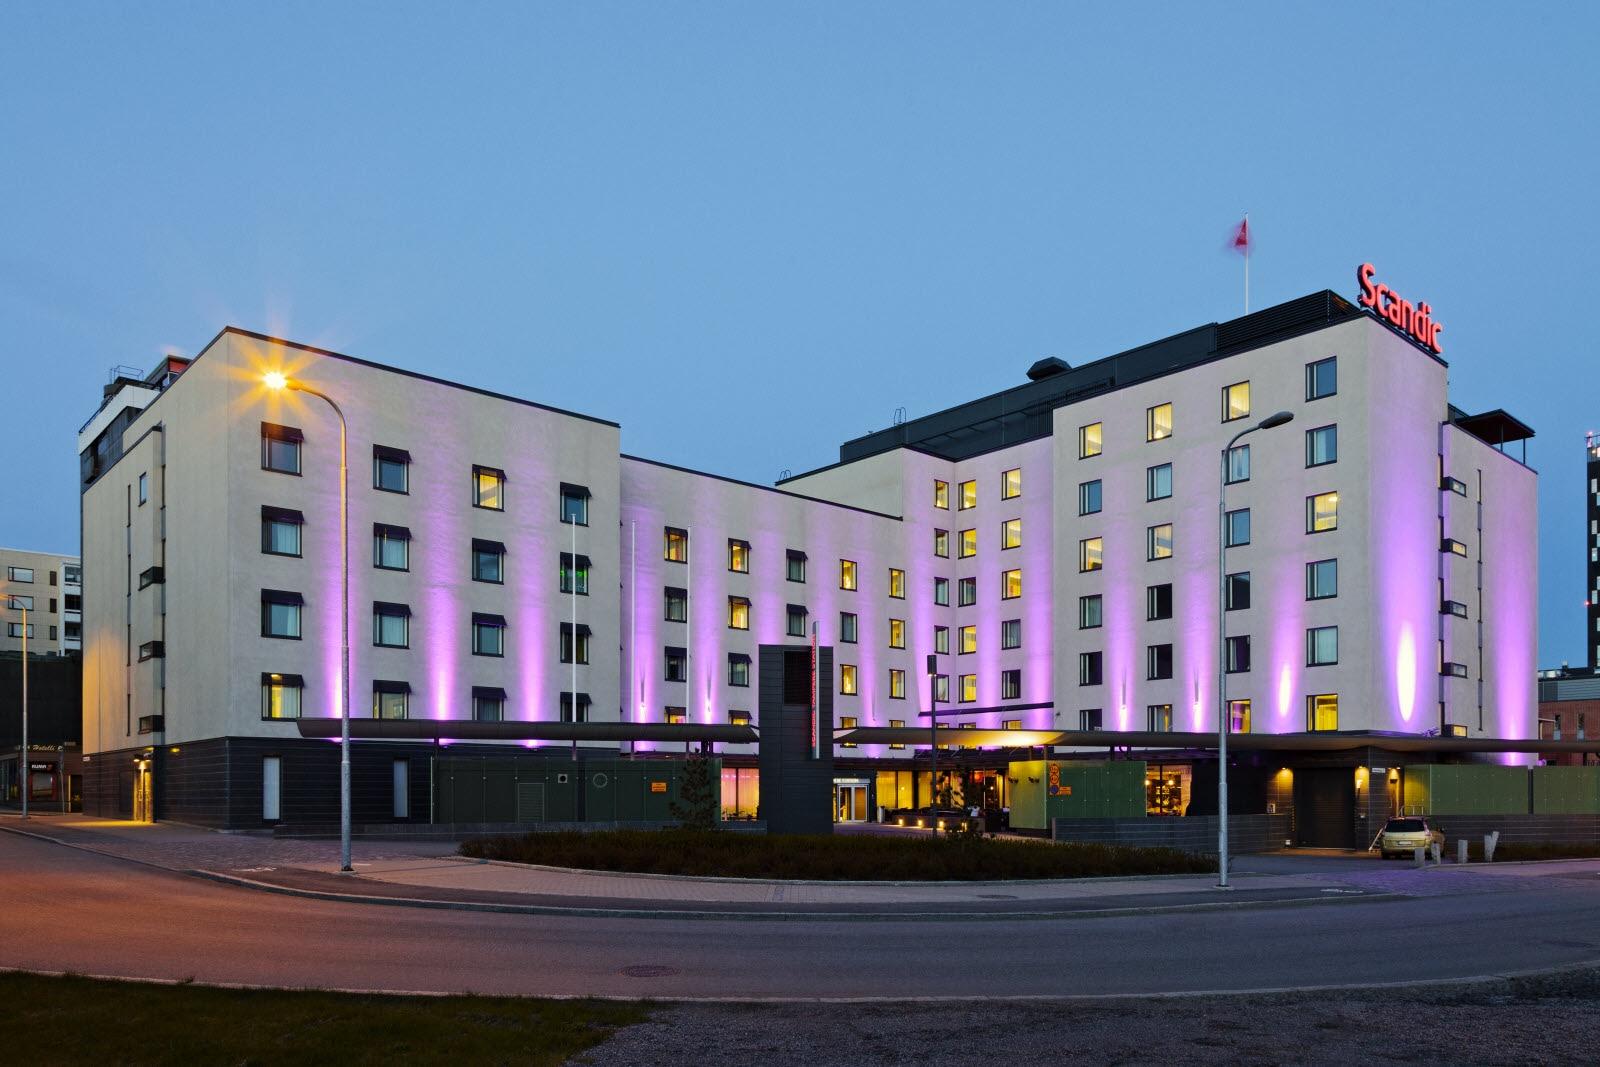 Hotellit Tampere